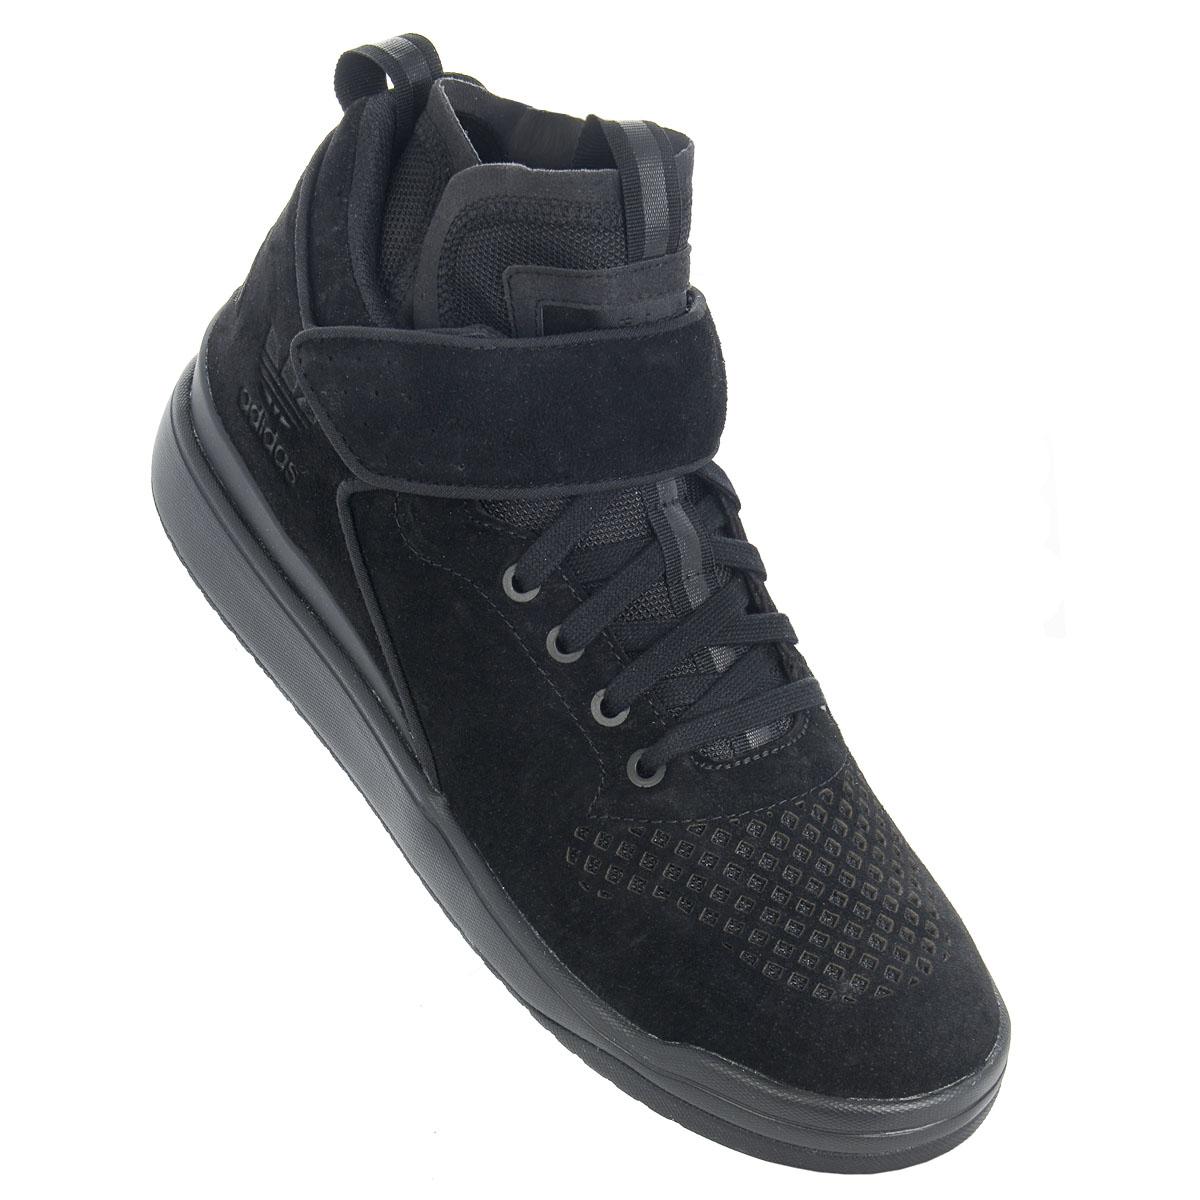 NEU Schwarz adidas Originals Veritas-X caballeros  zapatos  Schwarz NEU S75641 SALE 59c014